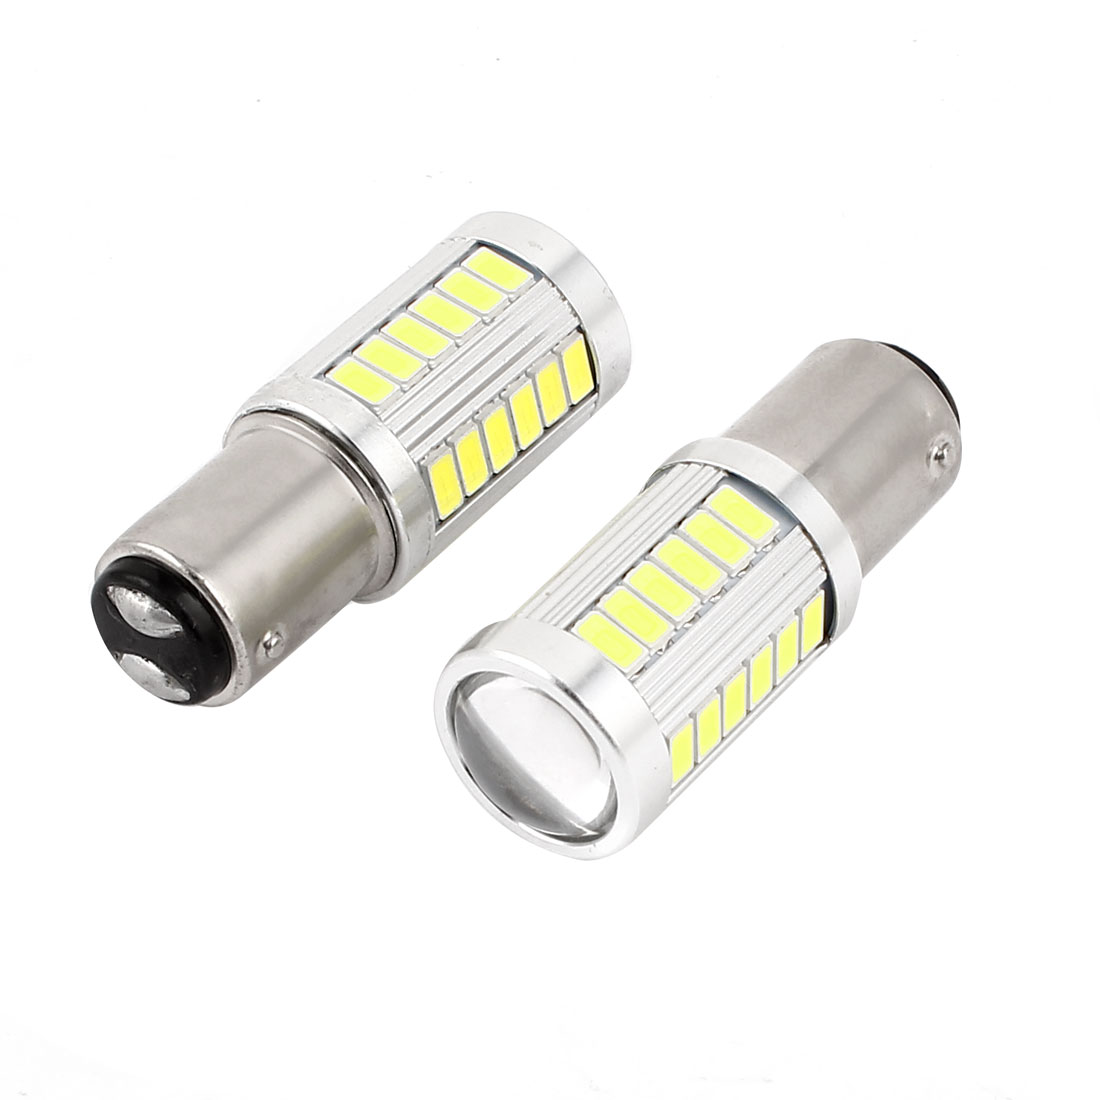 2 Pcs 1157 White 33-LED 5630 SMD Stopping Parking Light Signal Bulb for Car